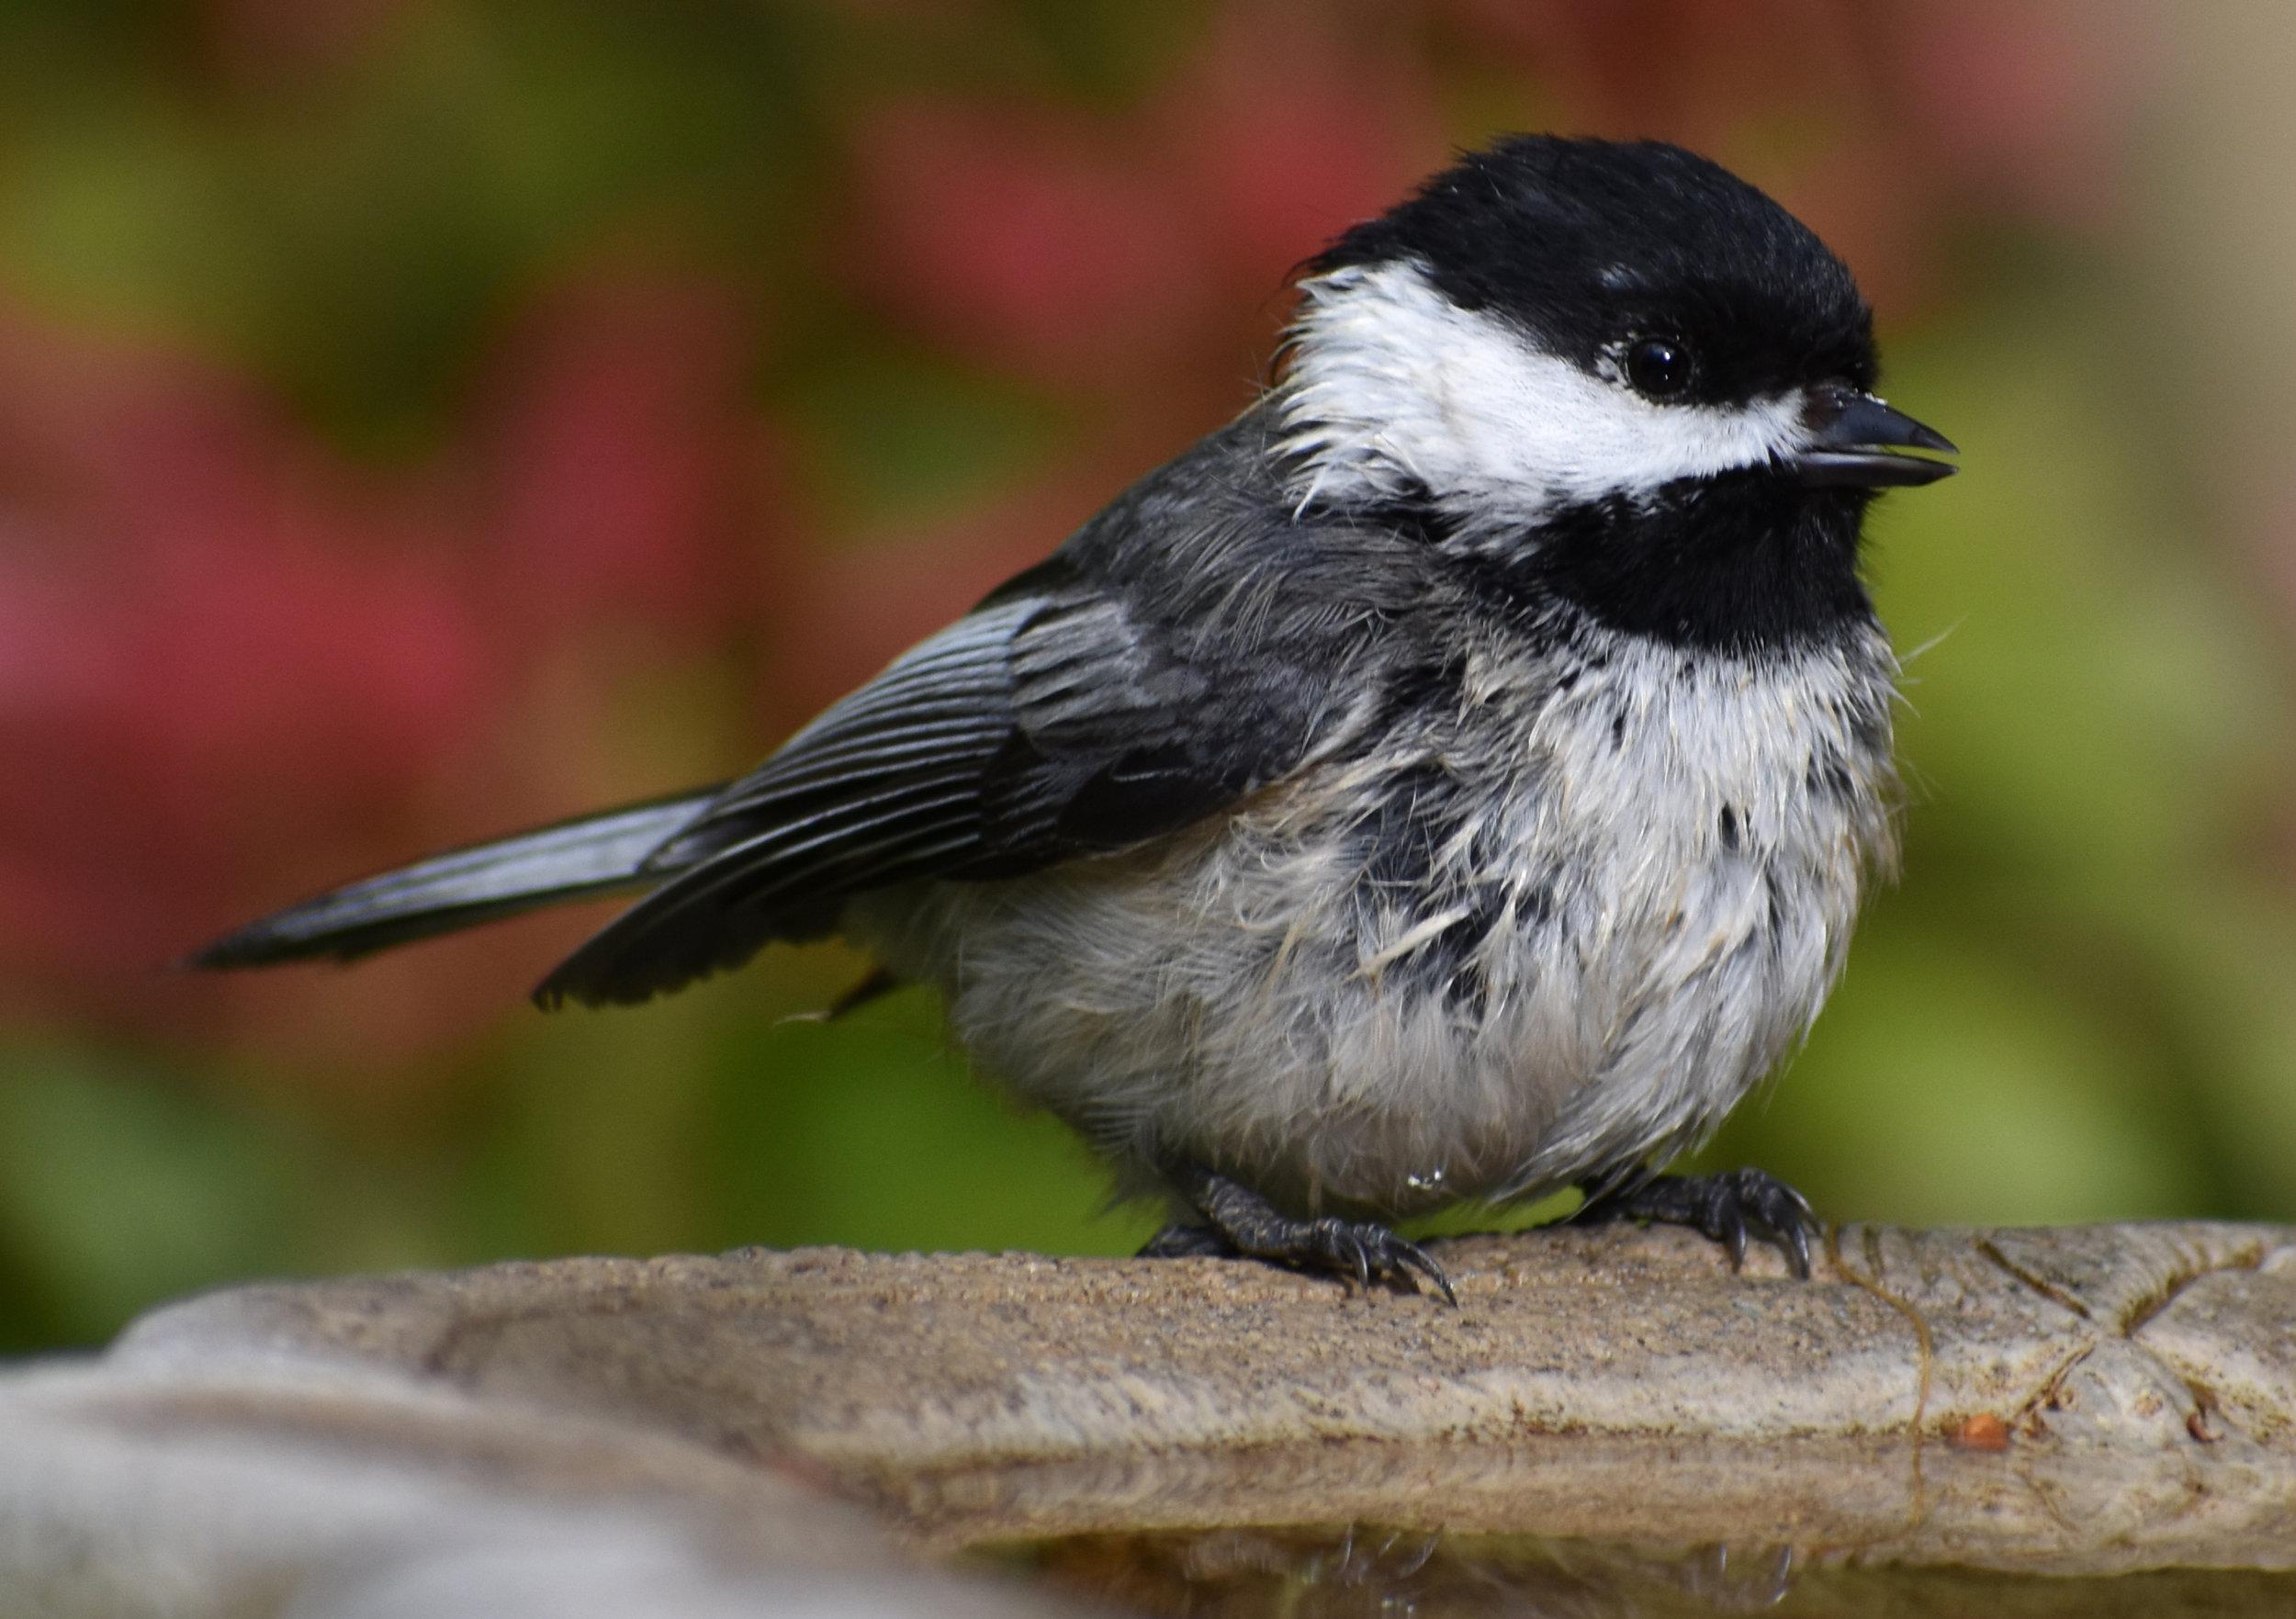 Black-Capped Chickadee at Birdbath